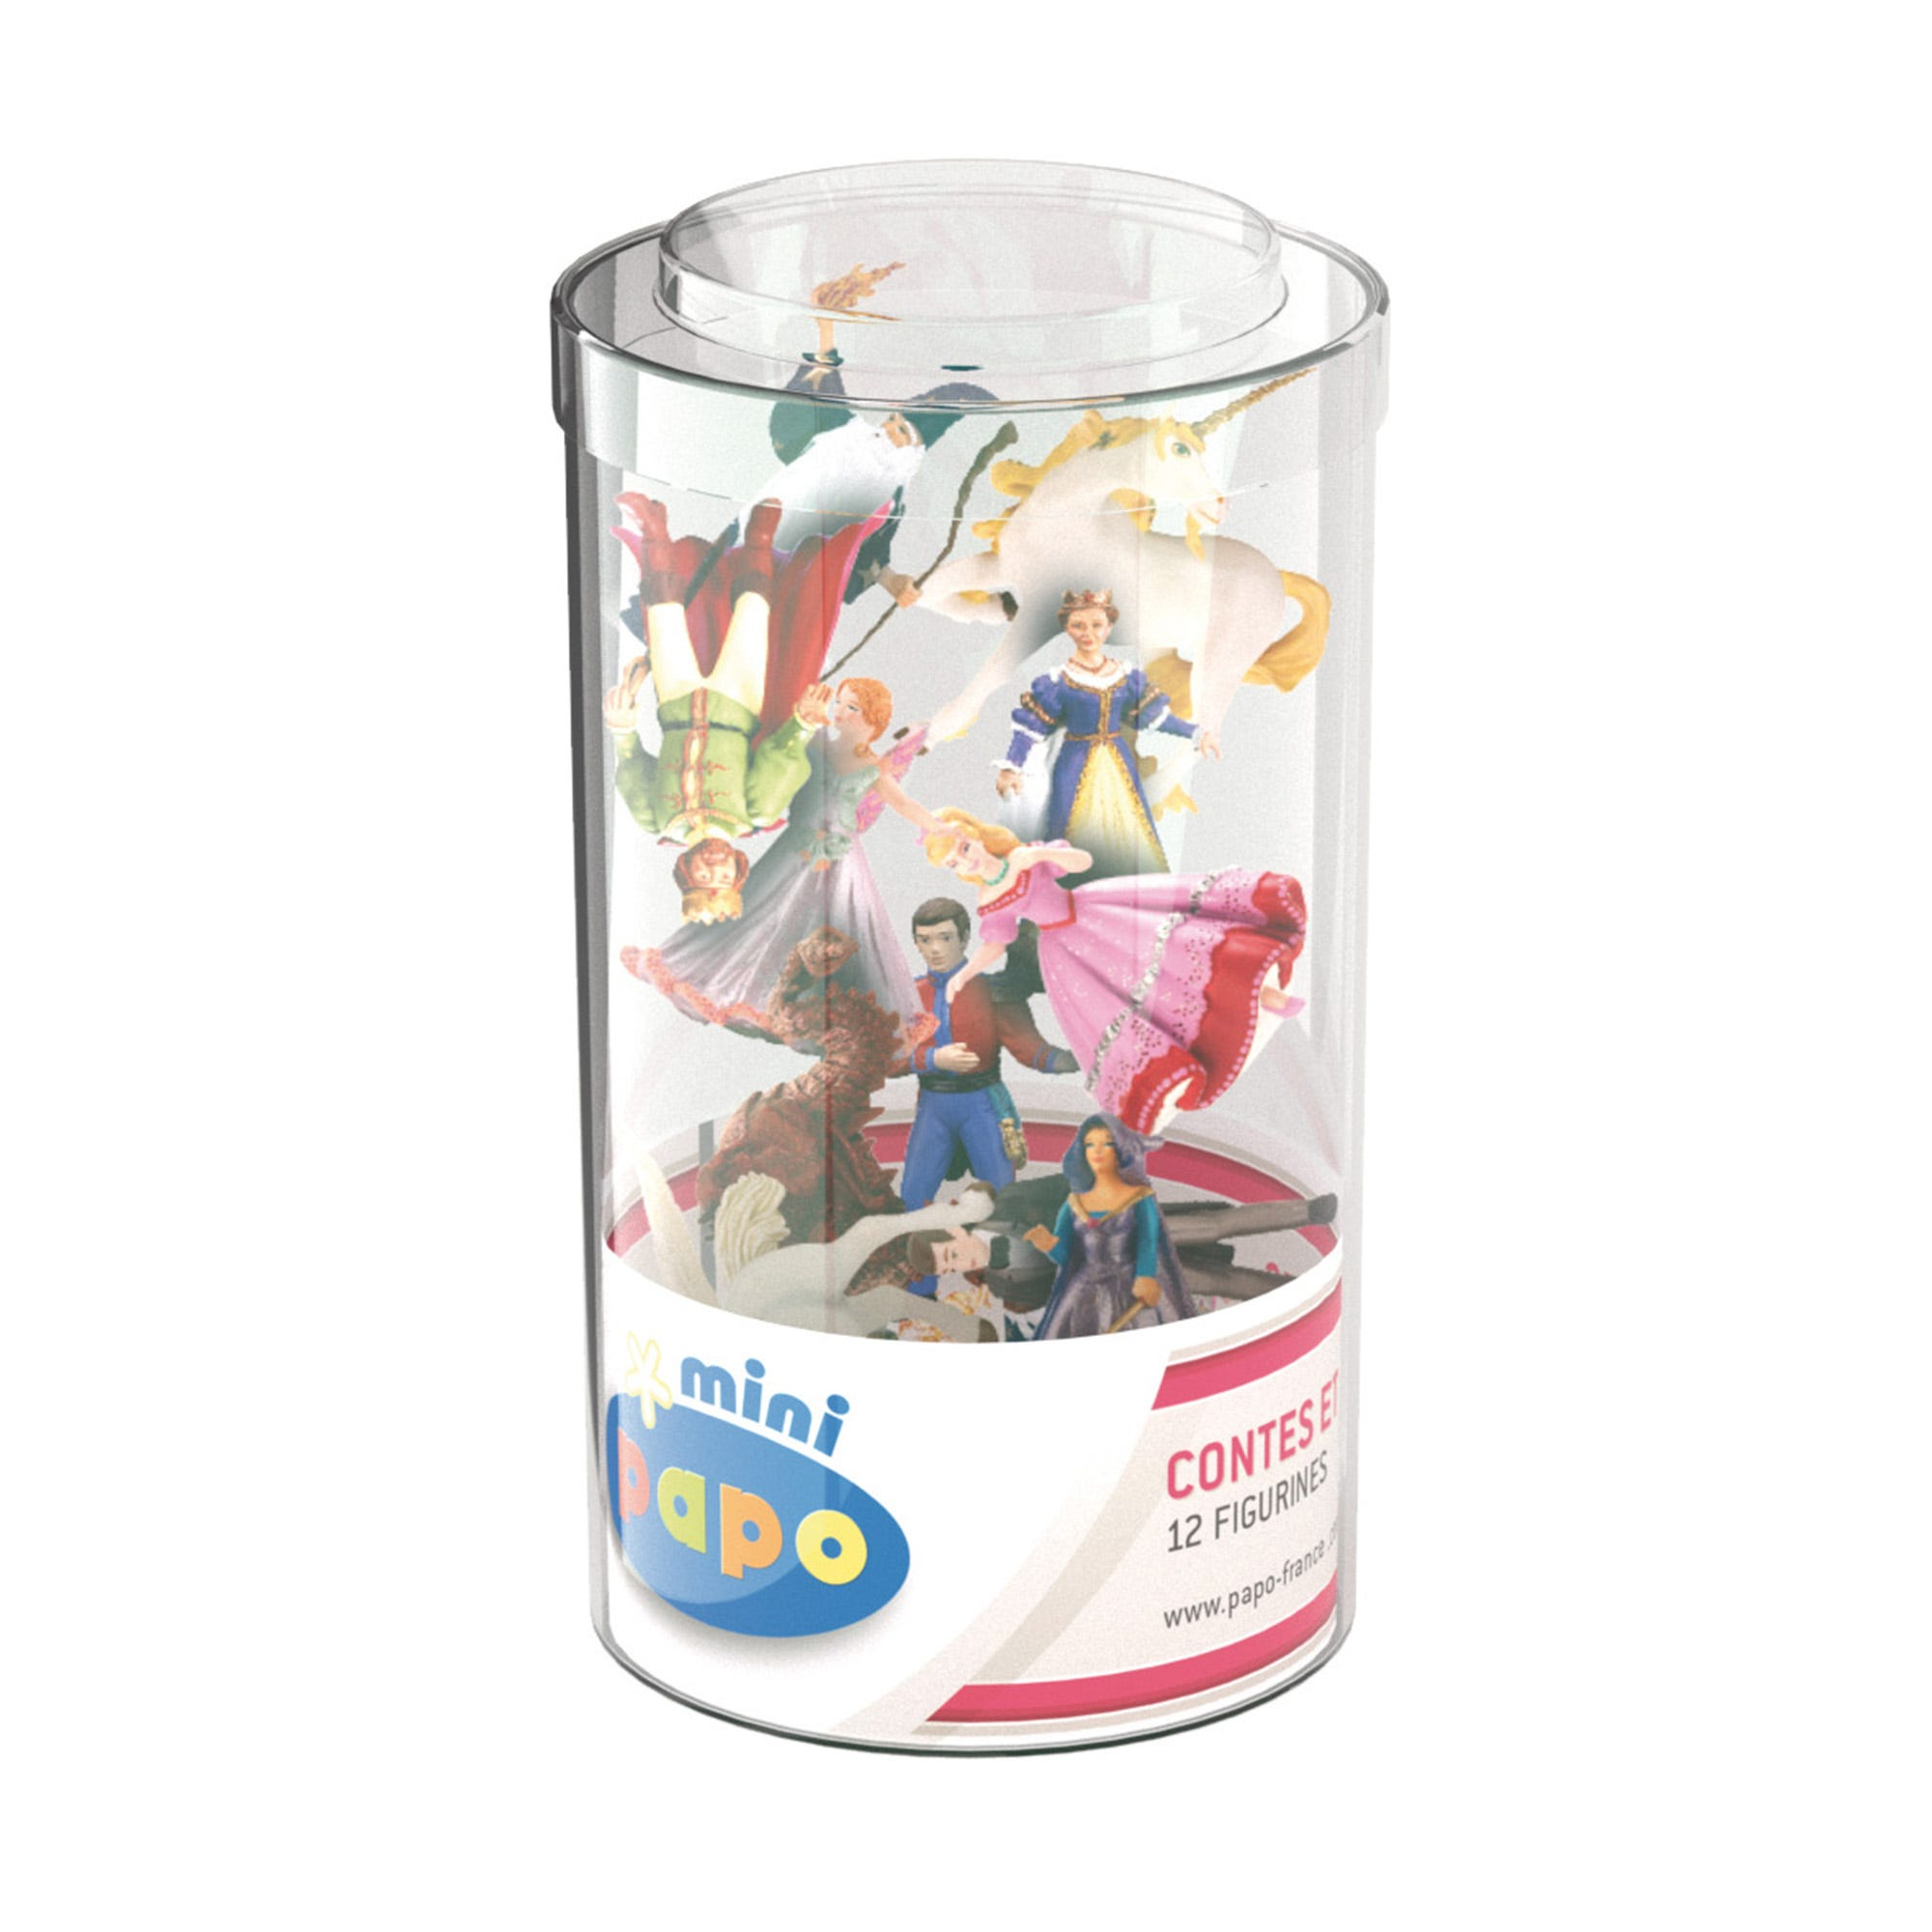 Papo Tales & Legends Mini Tub